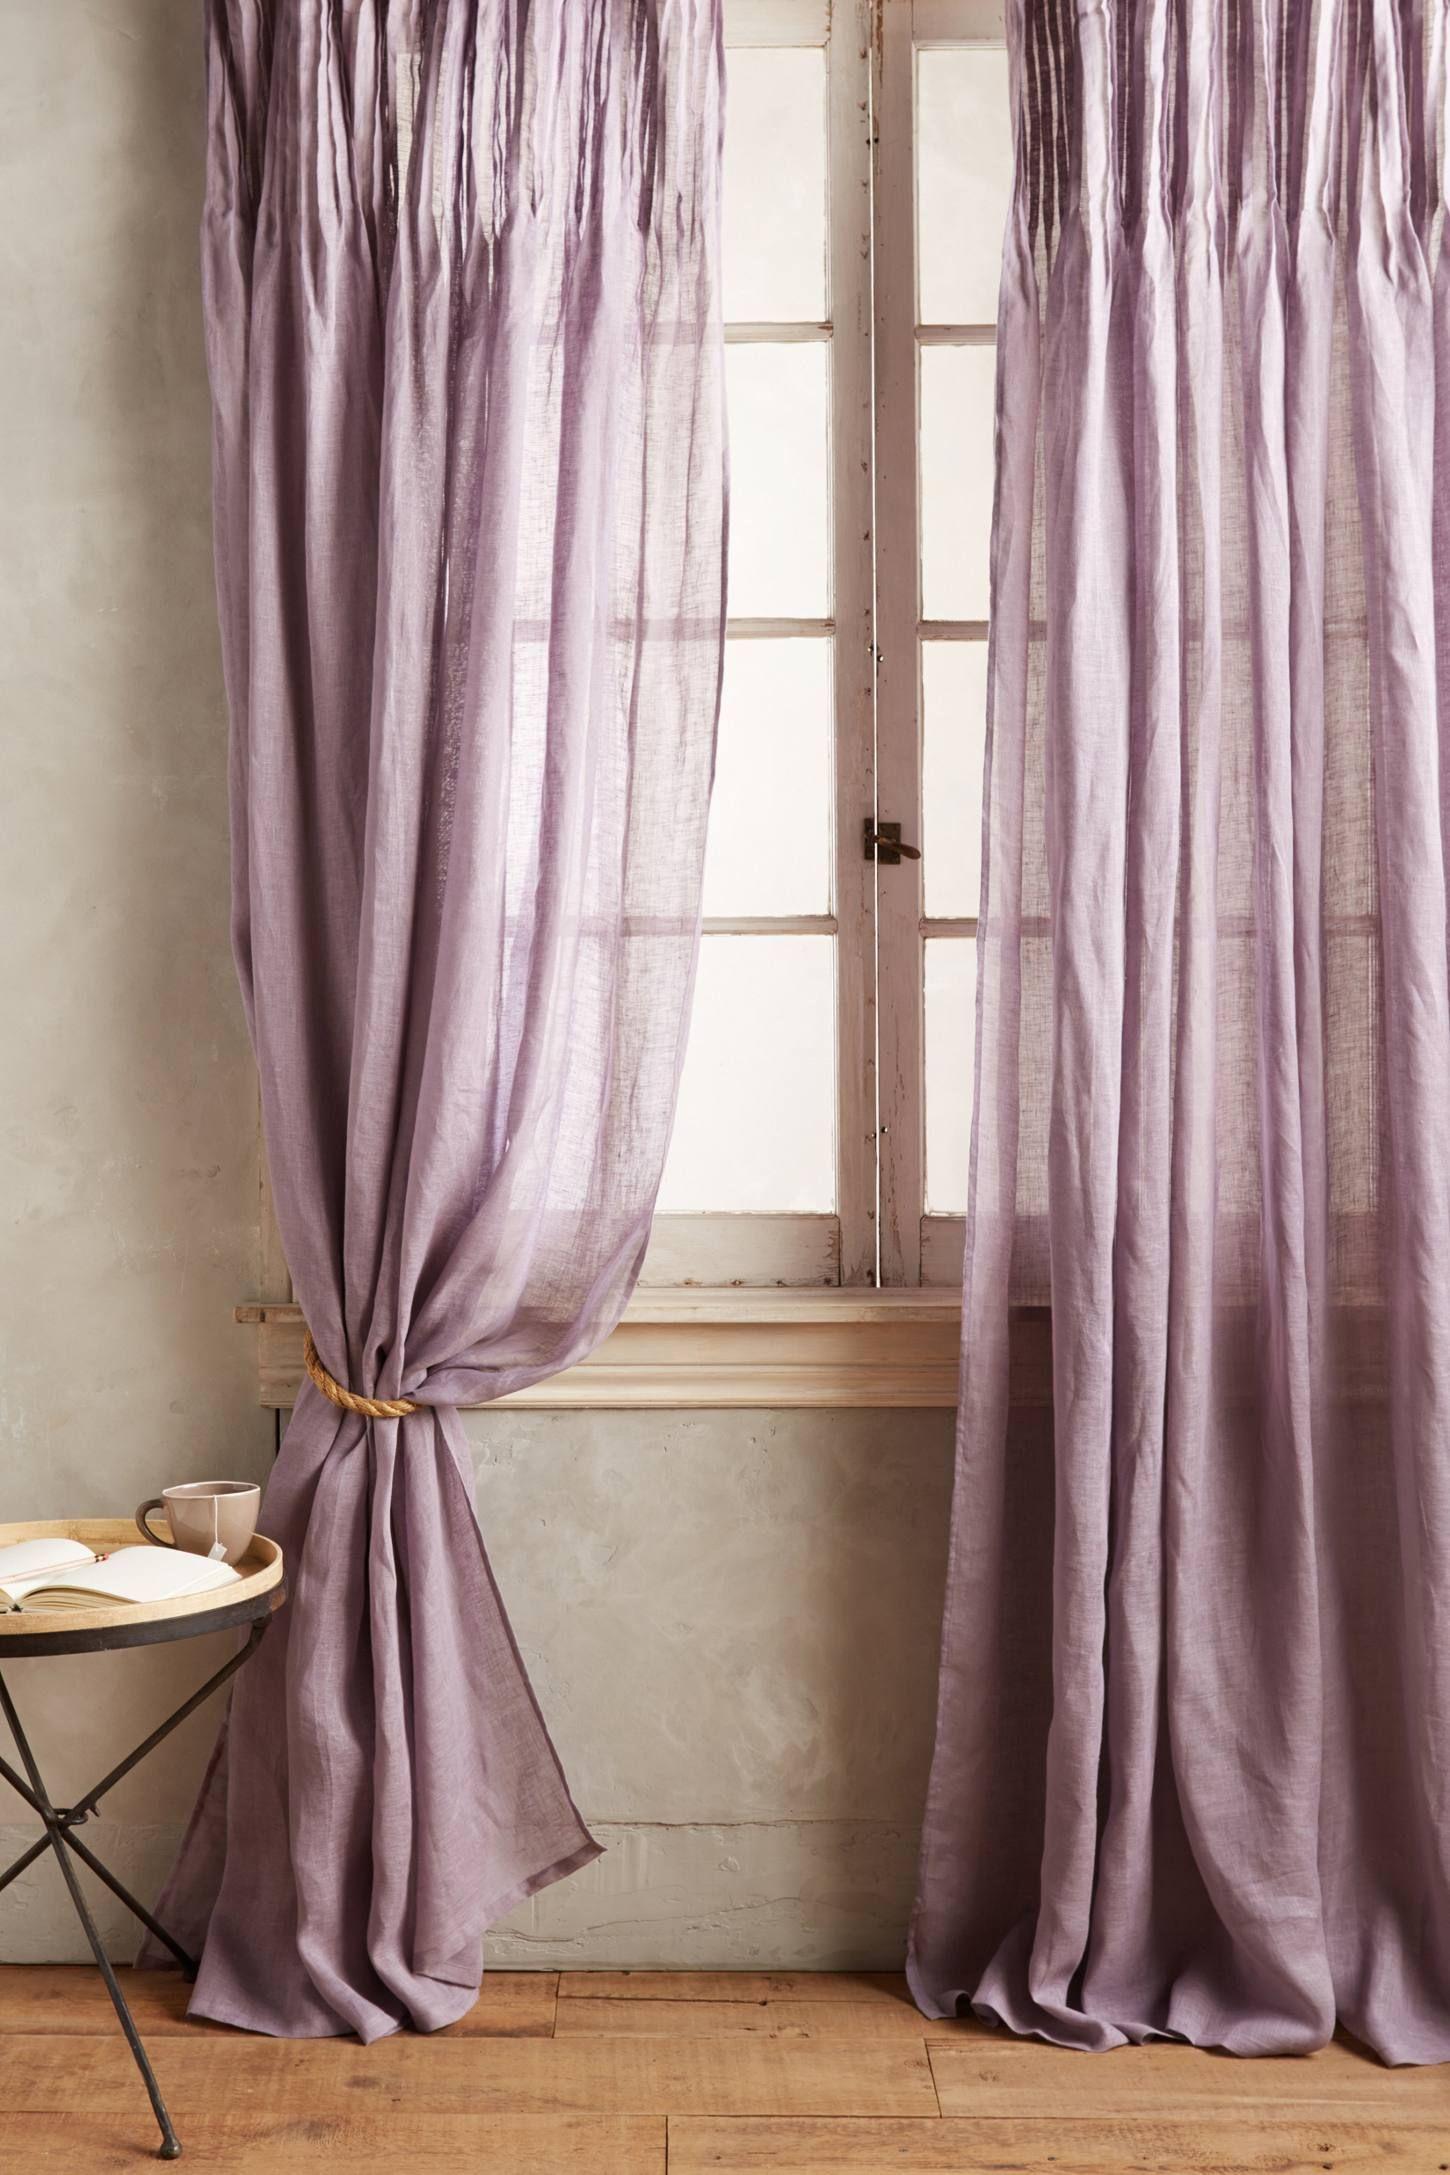 Pinch Pleat Curtains   Pinch pleat curtains, Home curtains ...